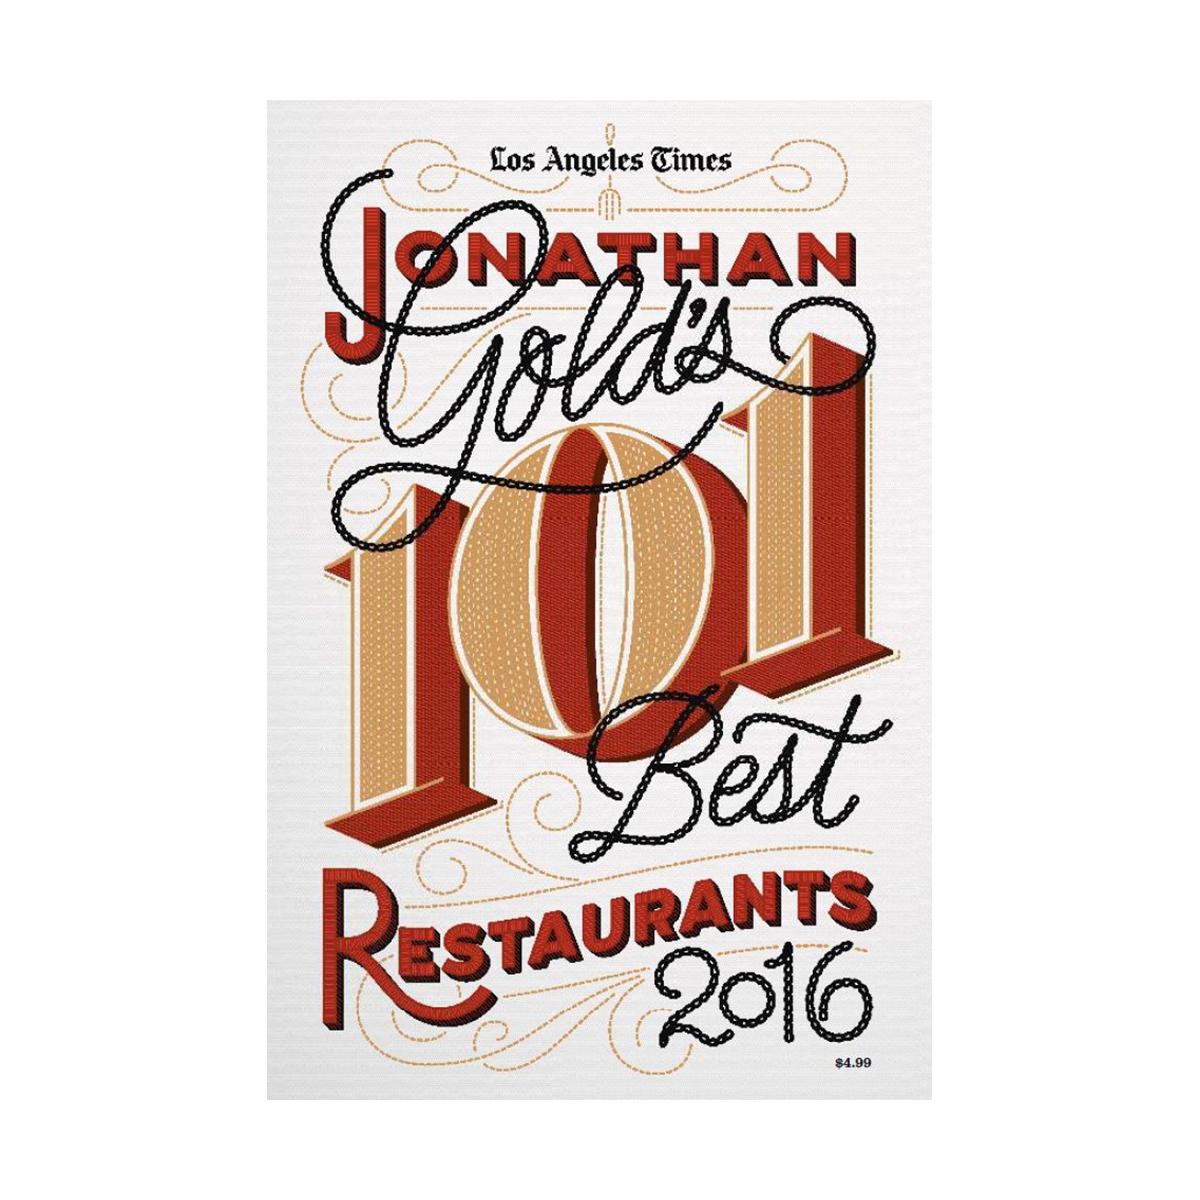 Jonathan Gold's 101 Best Restaurants - 2016